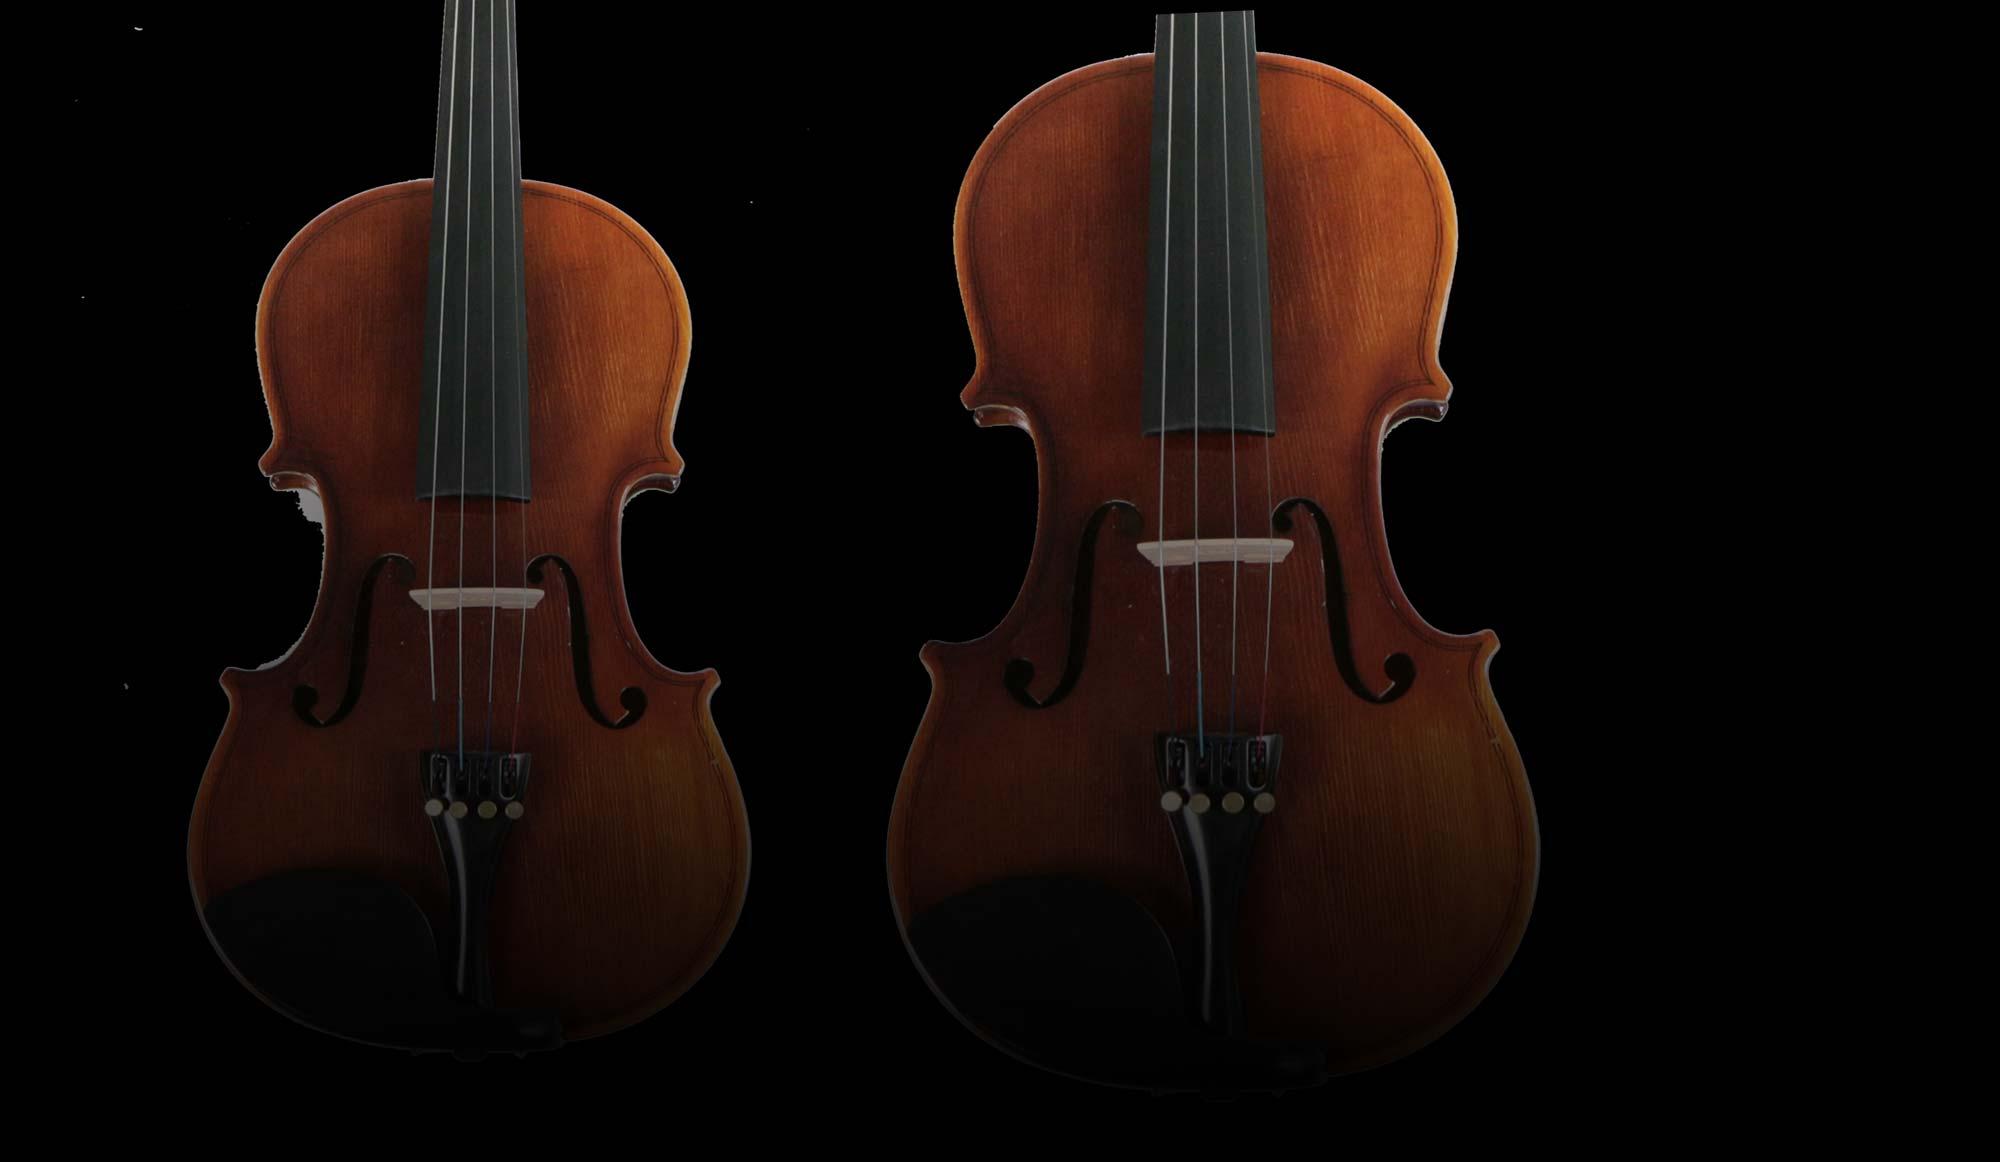 Carols Violin CVL-E900